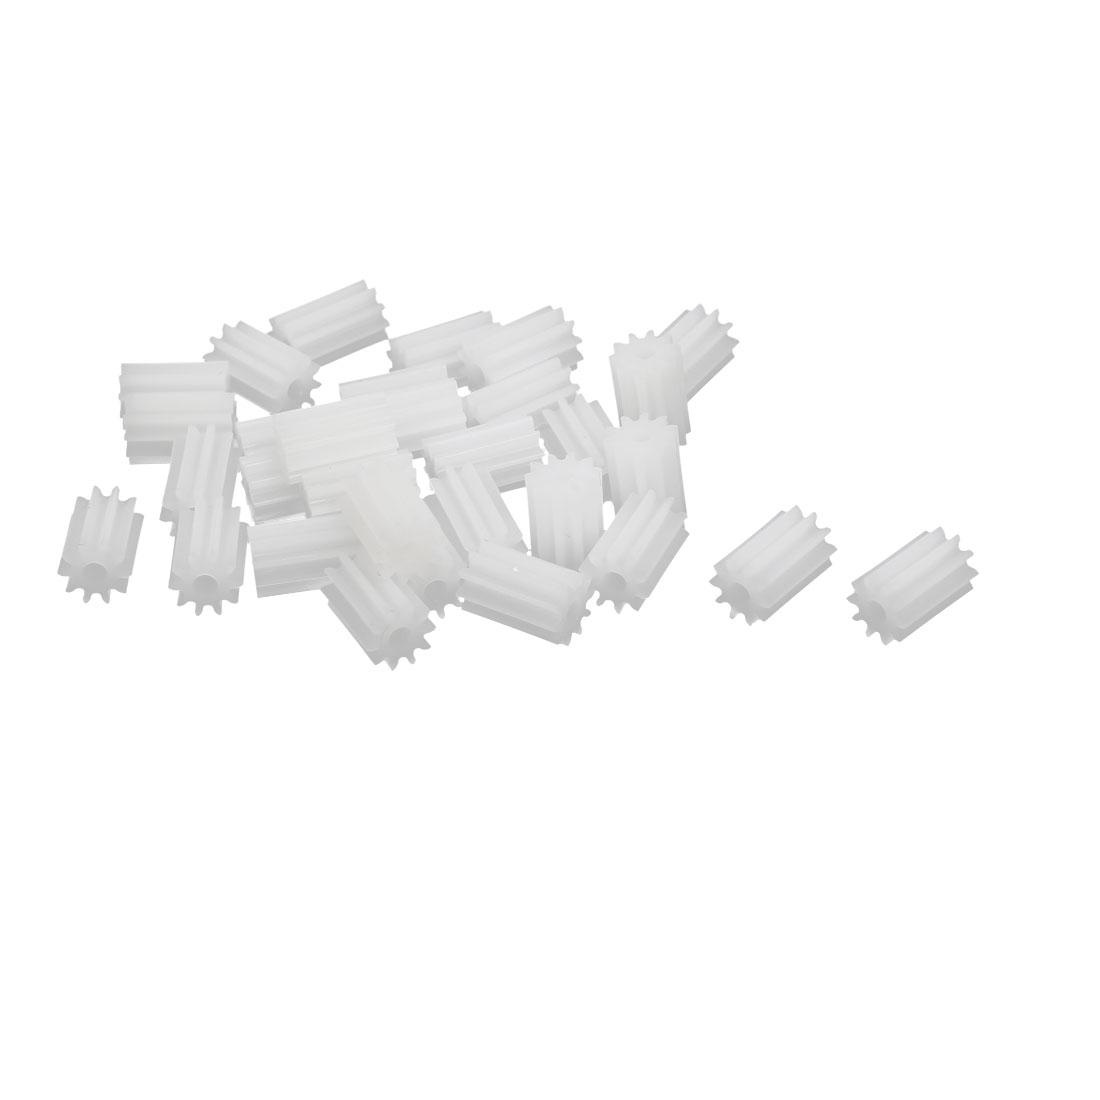 30pcs 10 Teeth 6mm Dia Plastic Gear Wheel for Car Motor Shaft